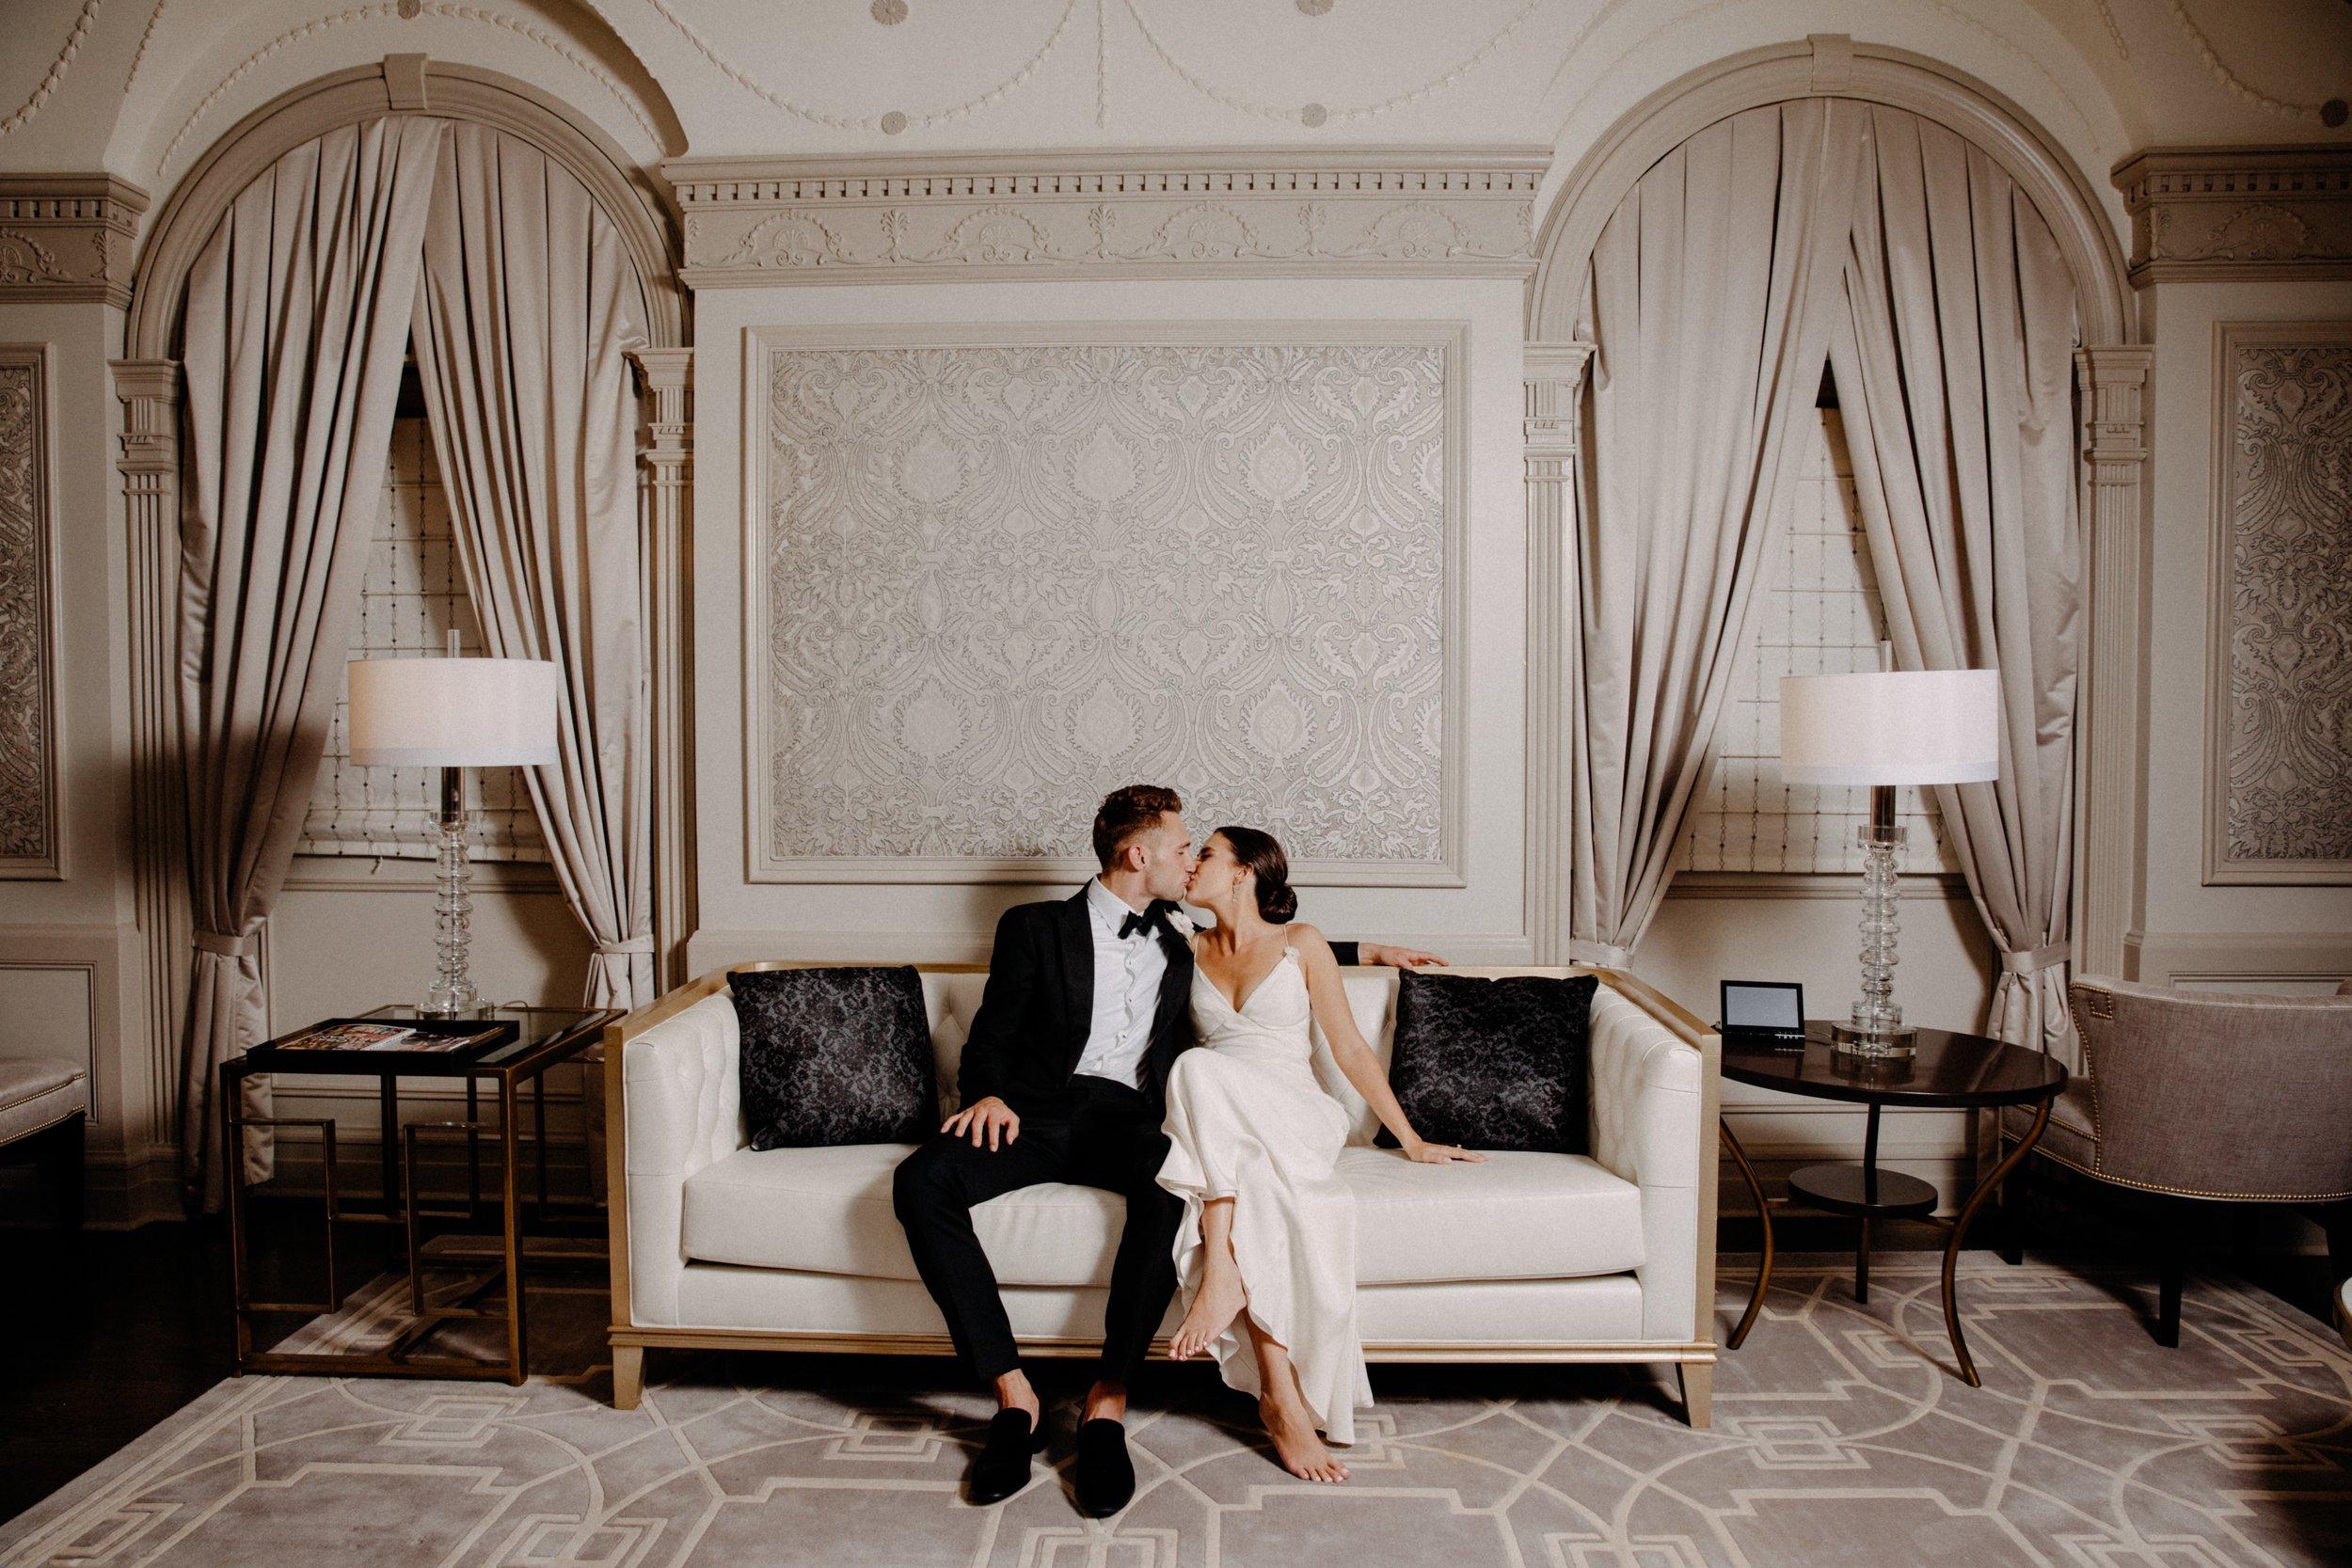 st-anthony-hotel-wedding-photography-10174san-antonio.JPG